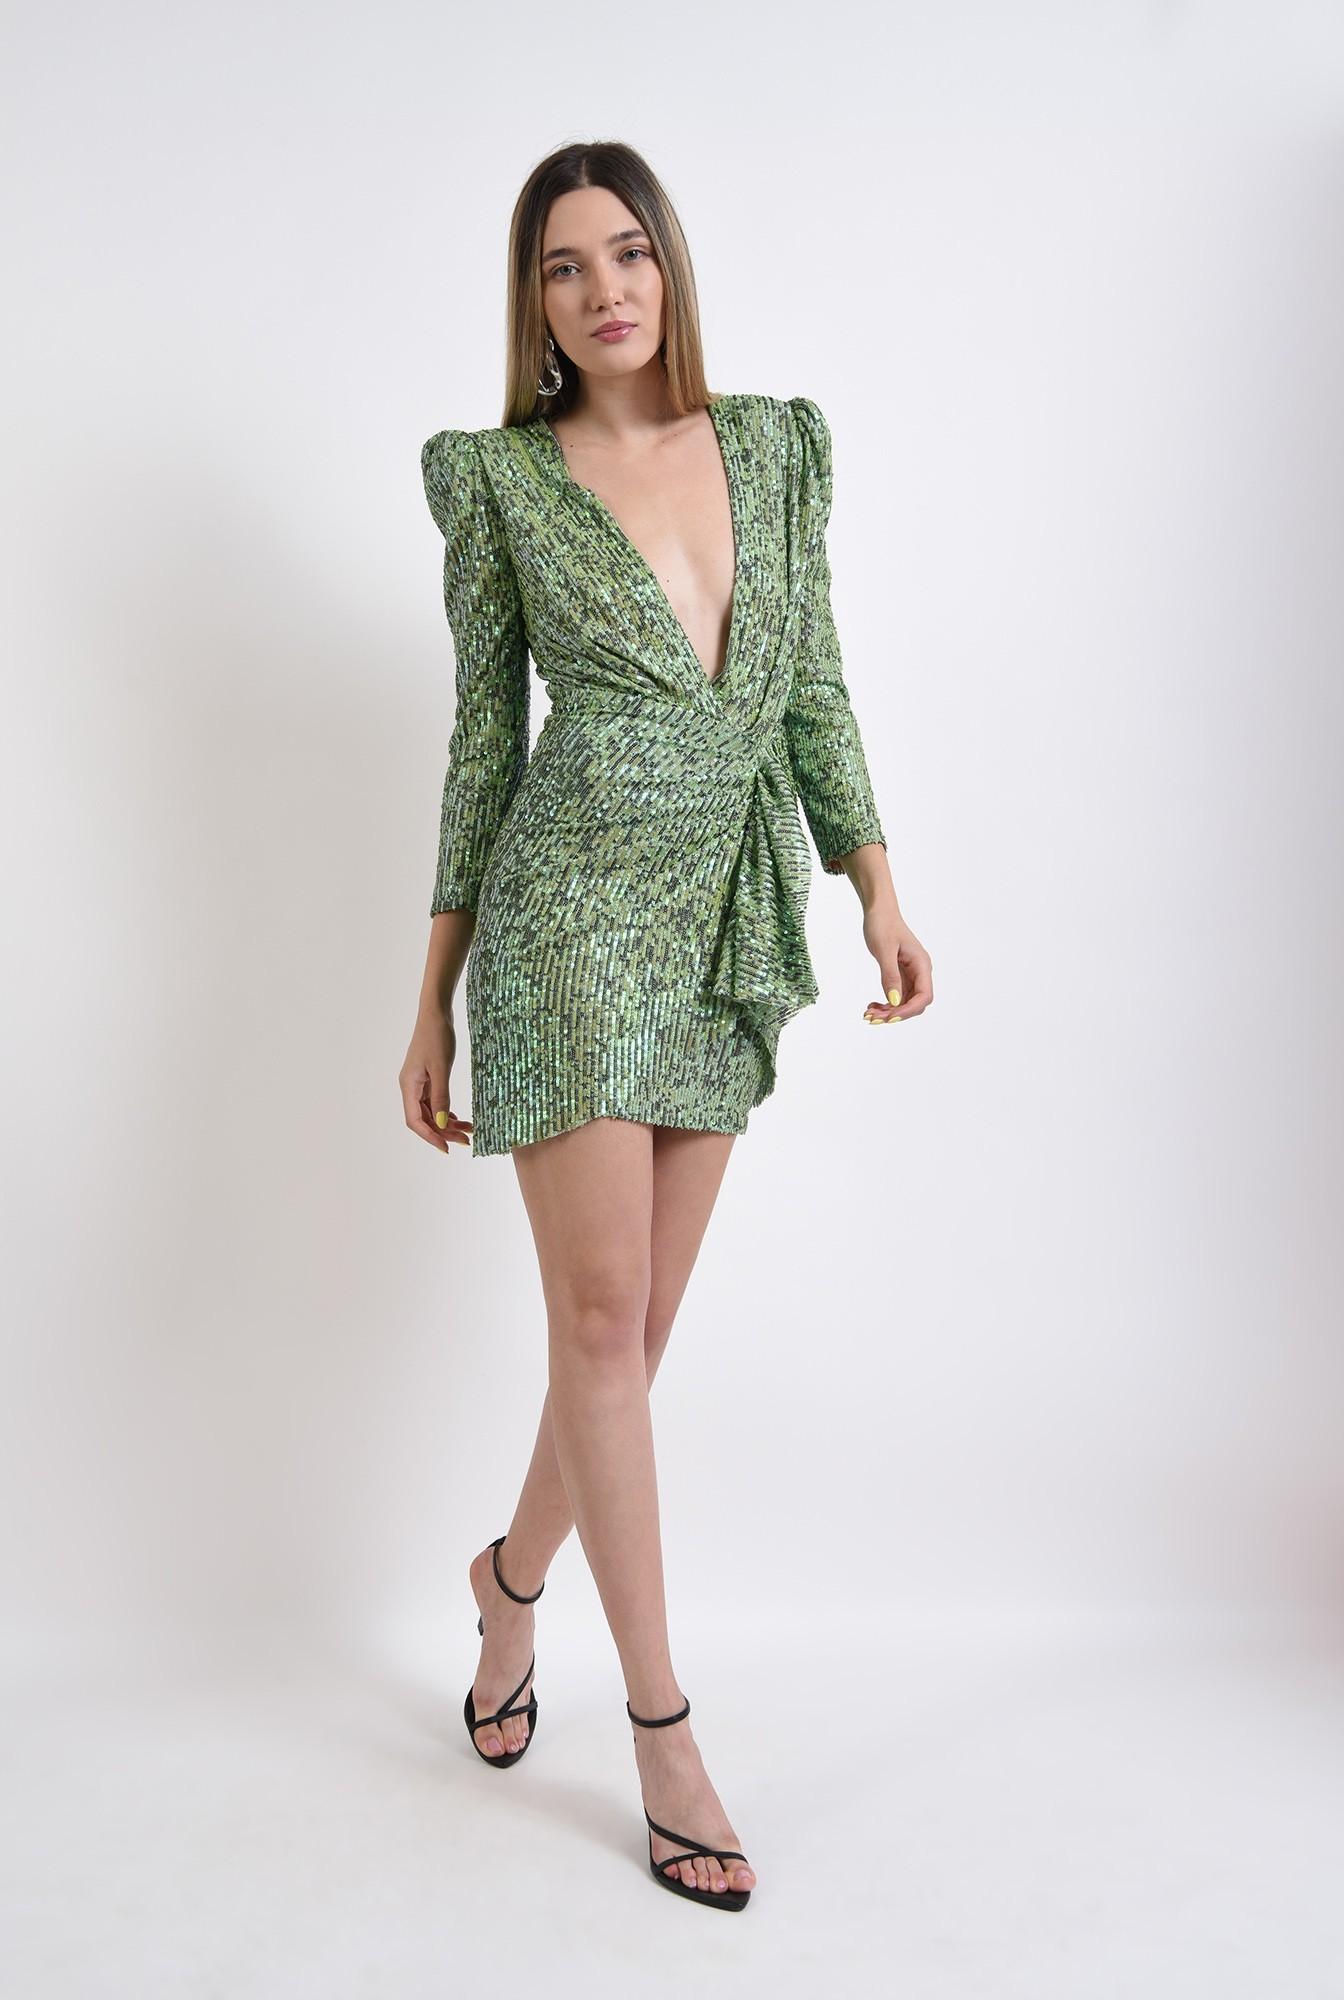 1 - rochie scurta, eleganta, paiete, decolteu adanc, verde